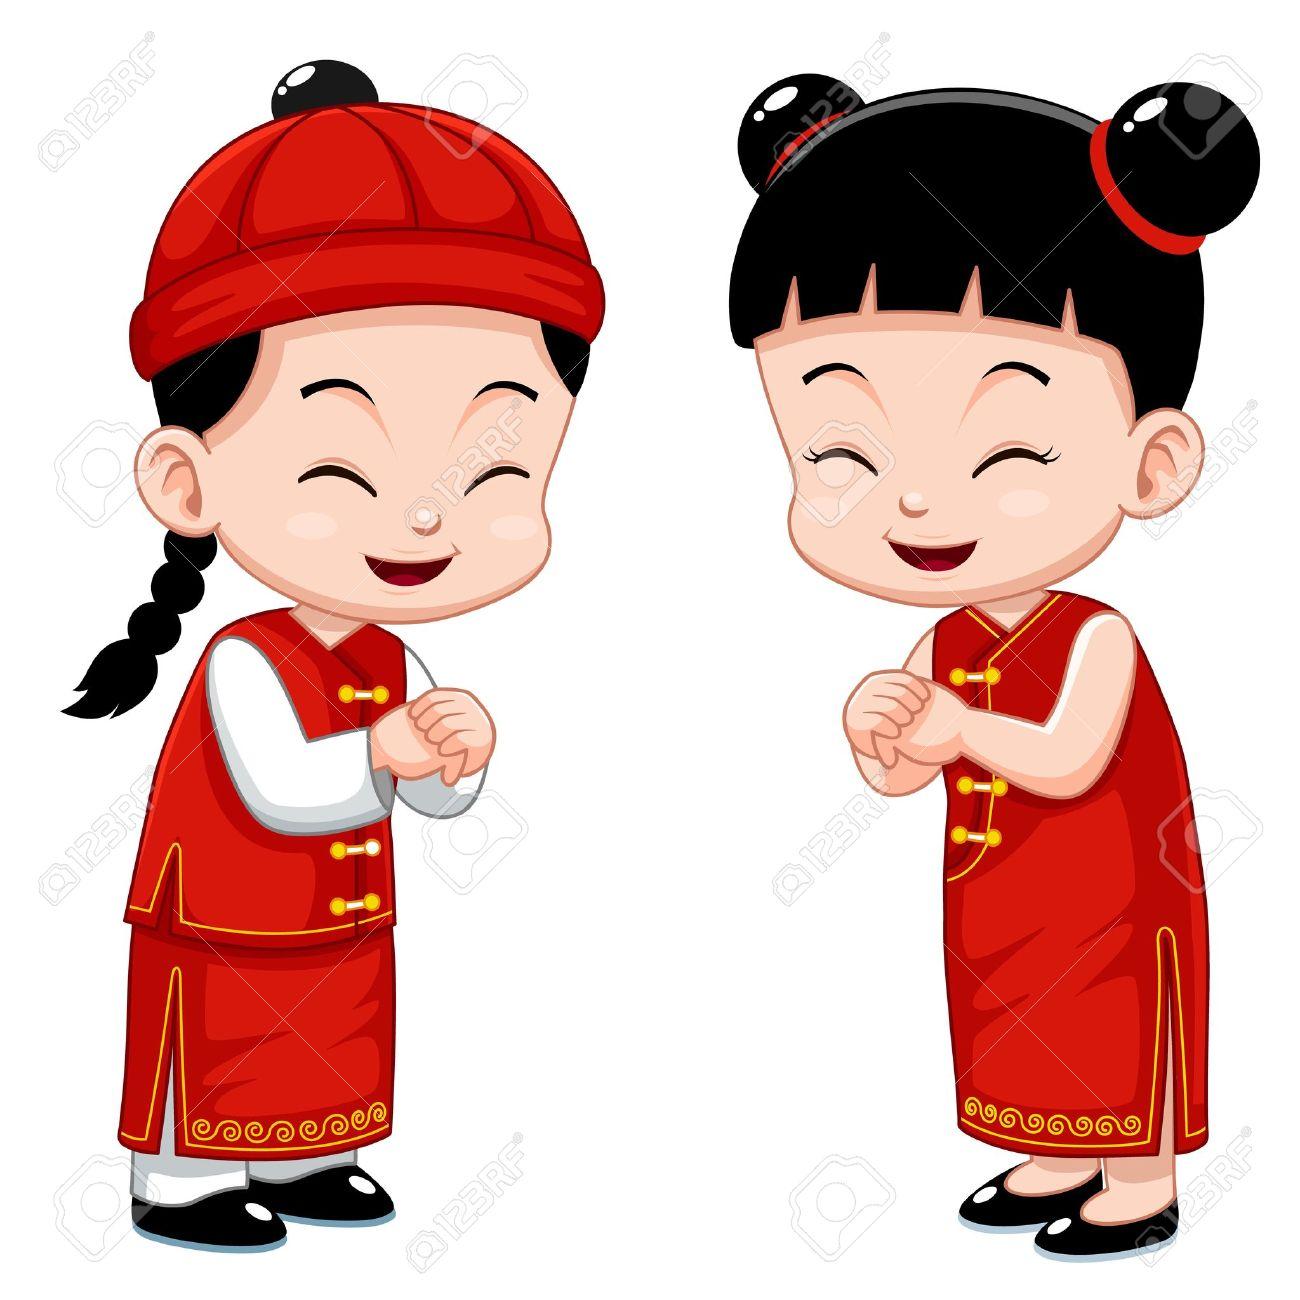 Chinese – ATLB